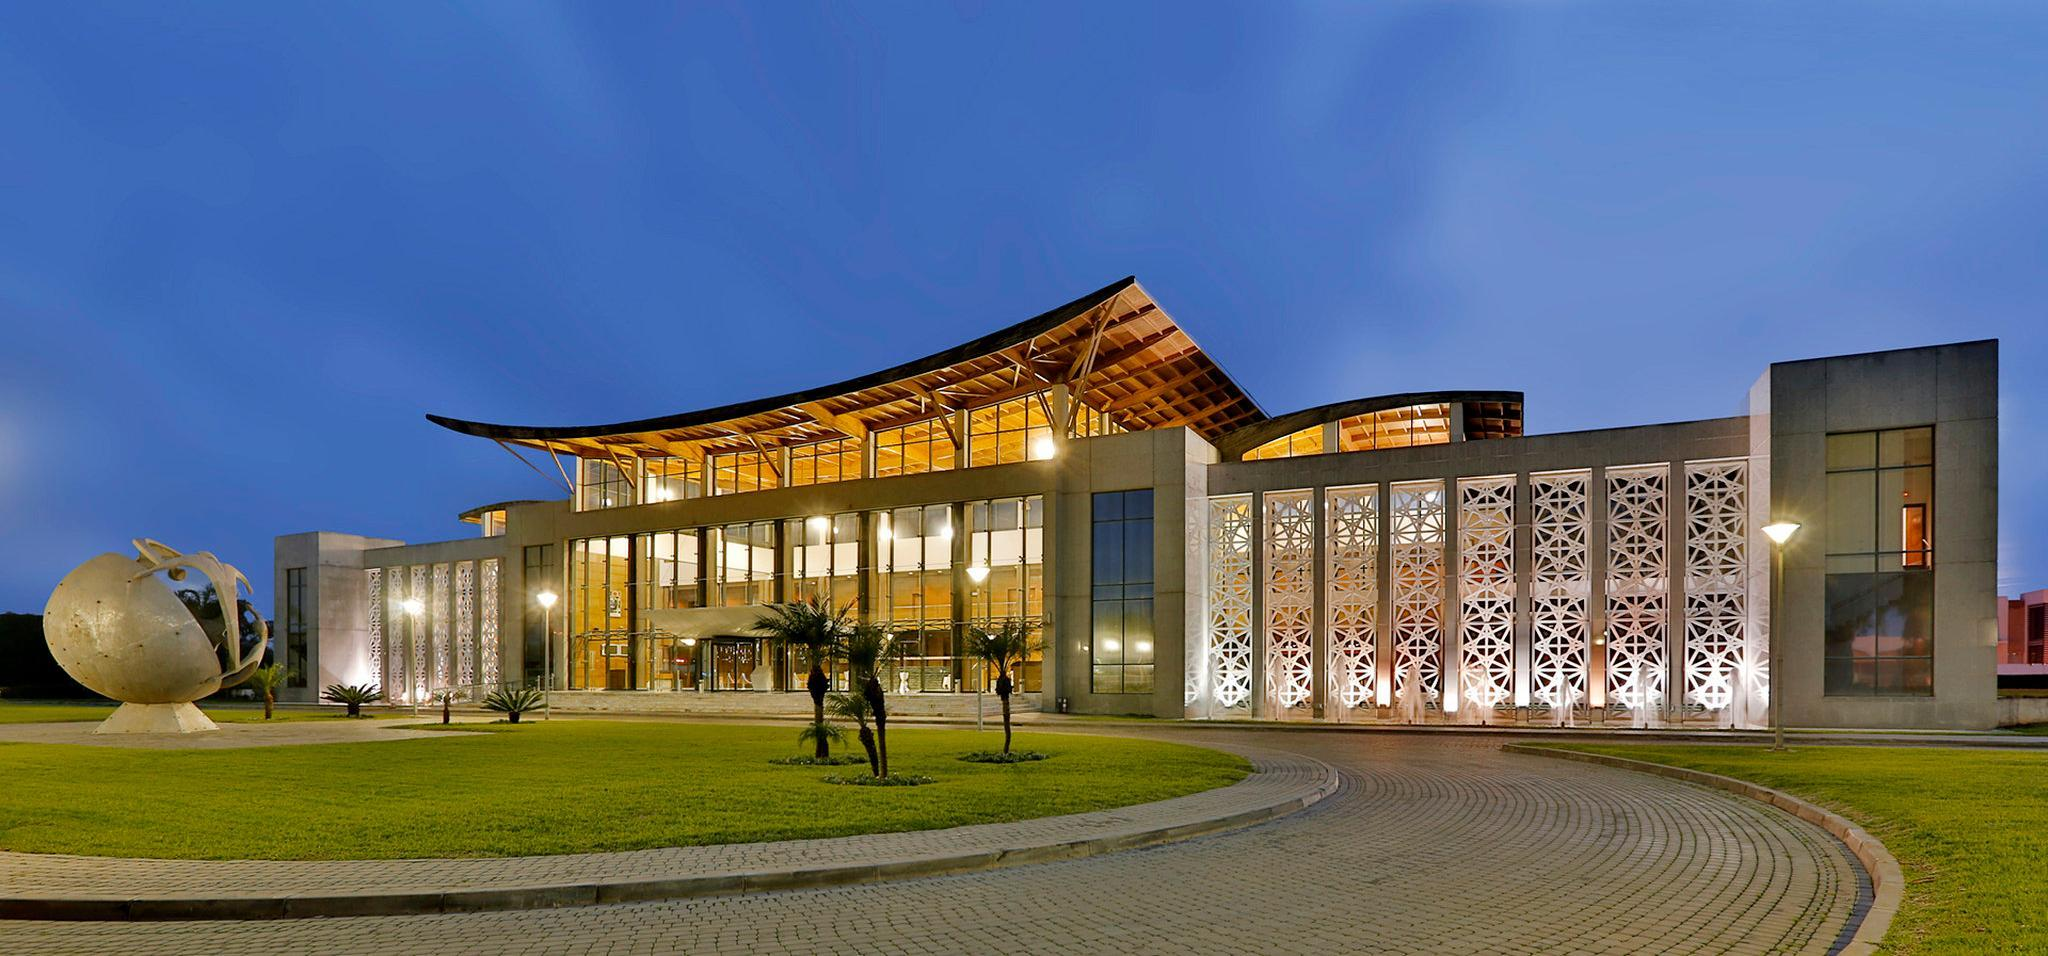 L Amphitrite Palace Resort And Spa, Skhirate-Témara